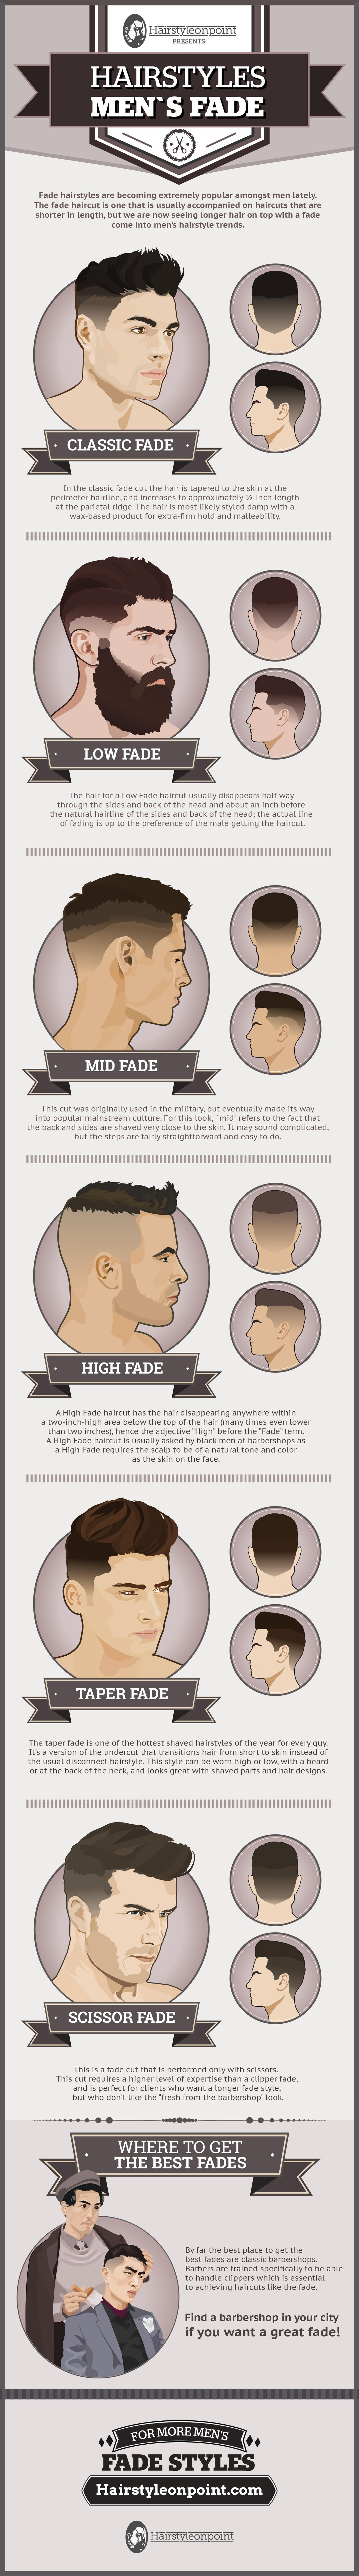 Mens haircut tutorials pin by jodi helvey cline on haircut tutorials  pinterest  hair